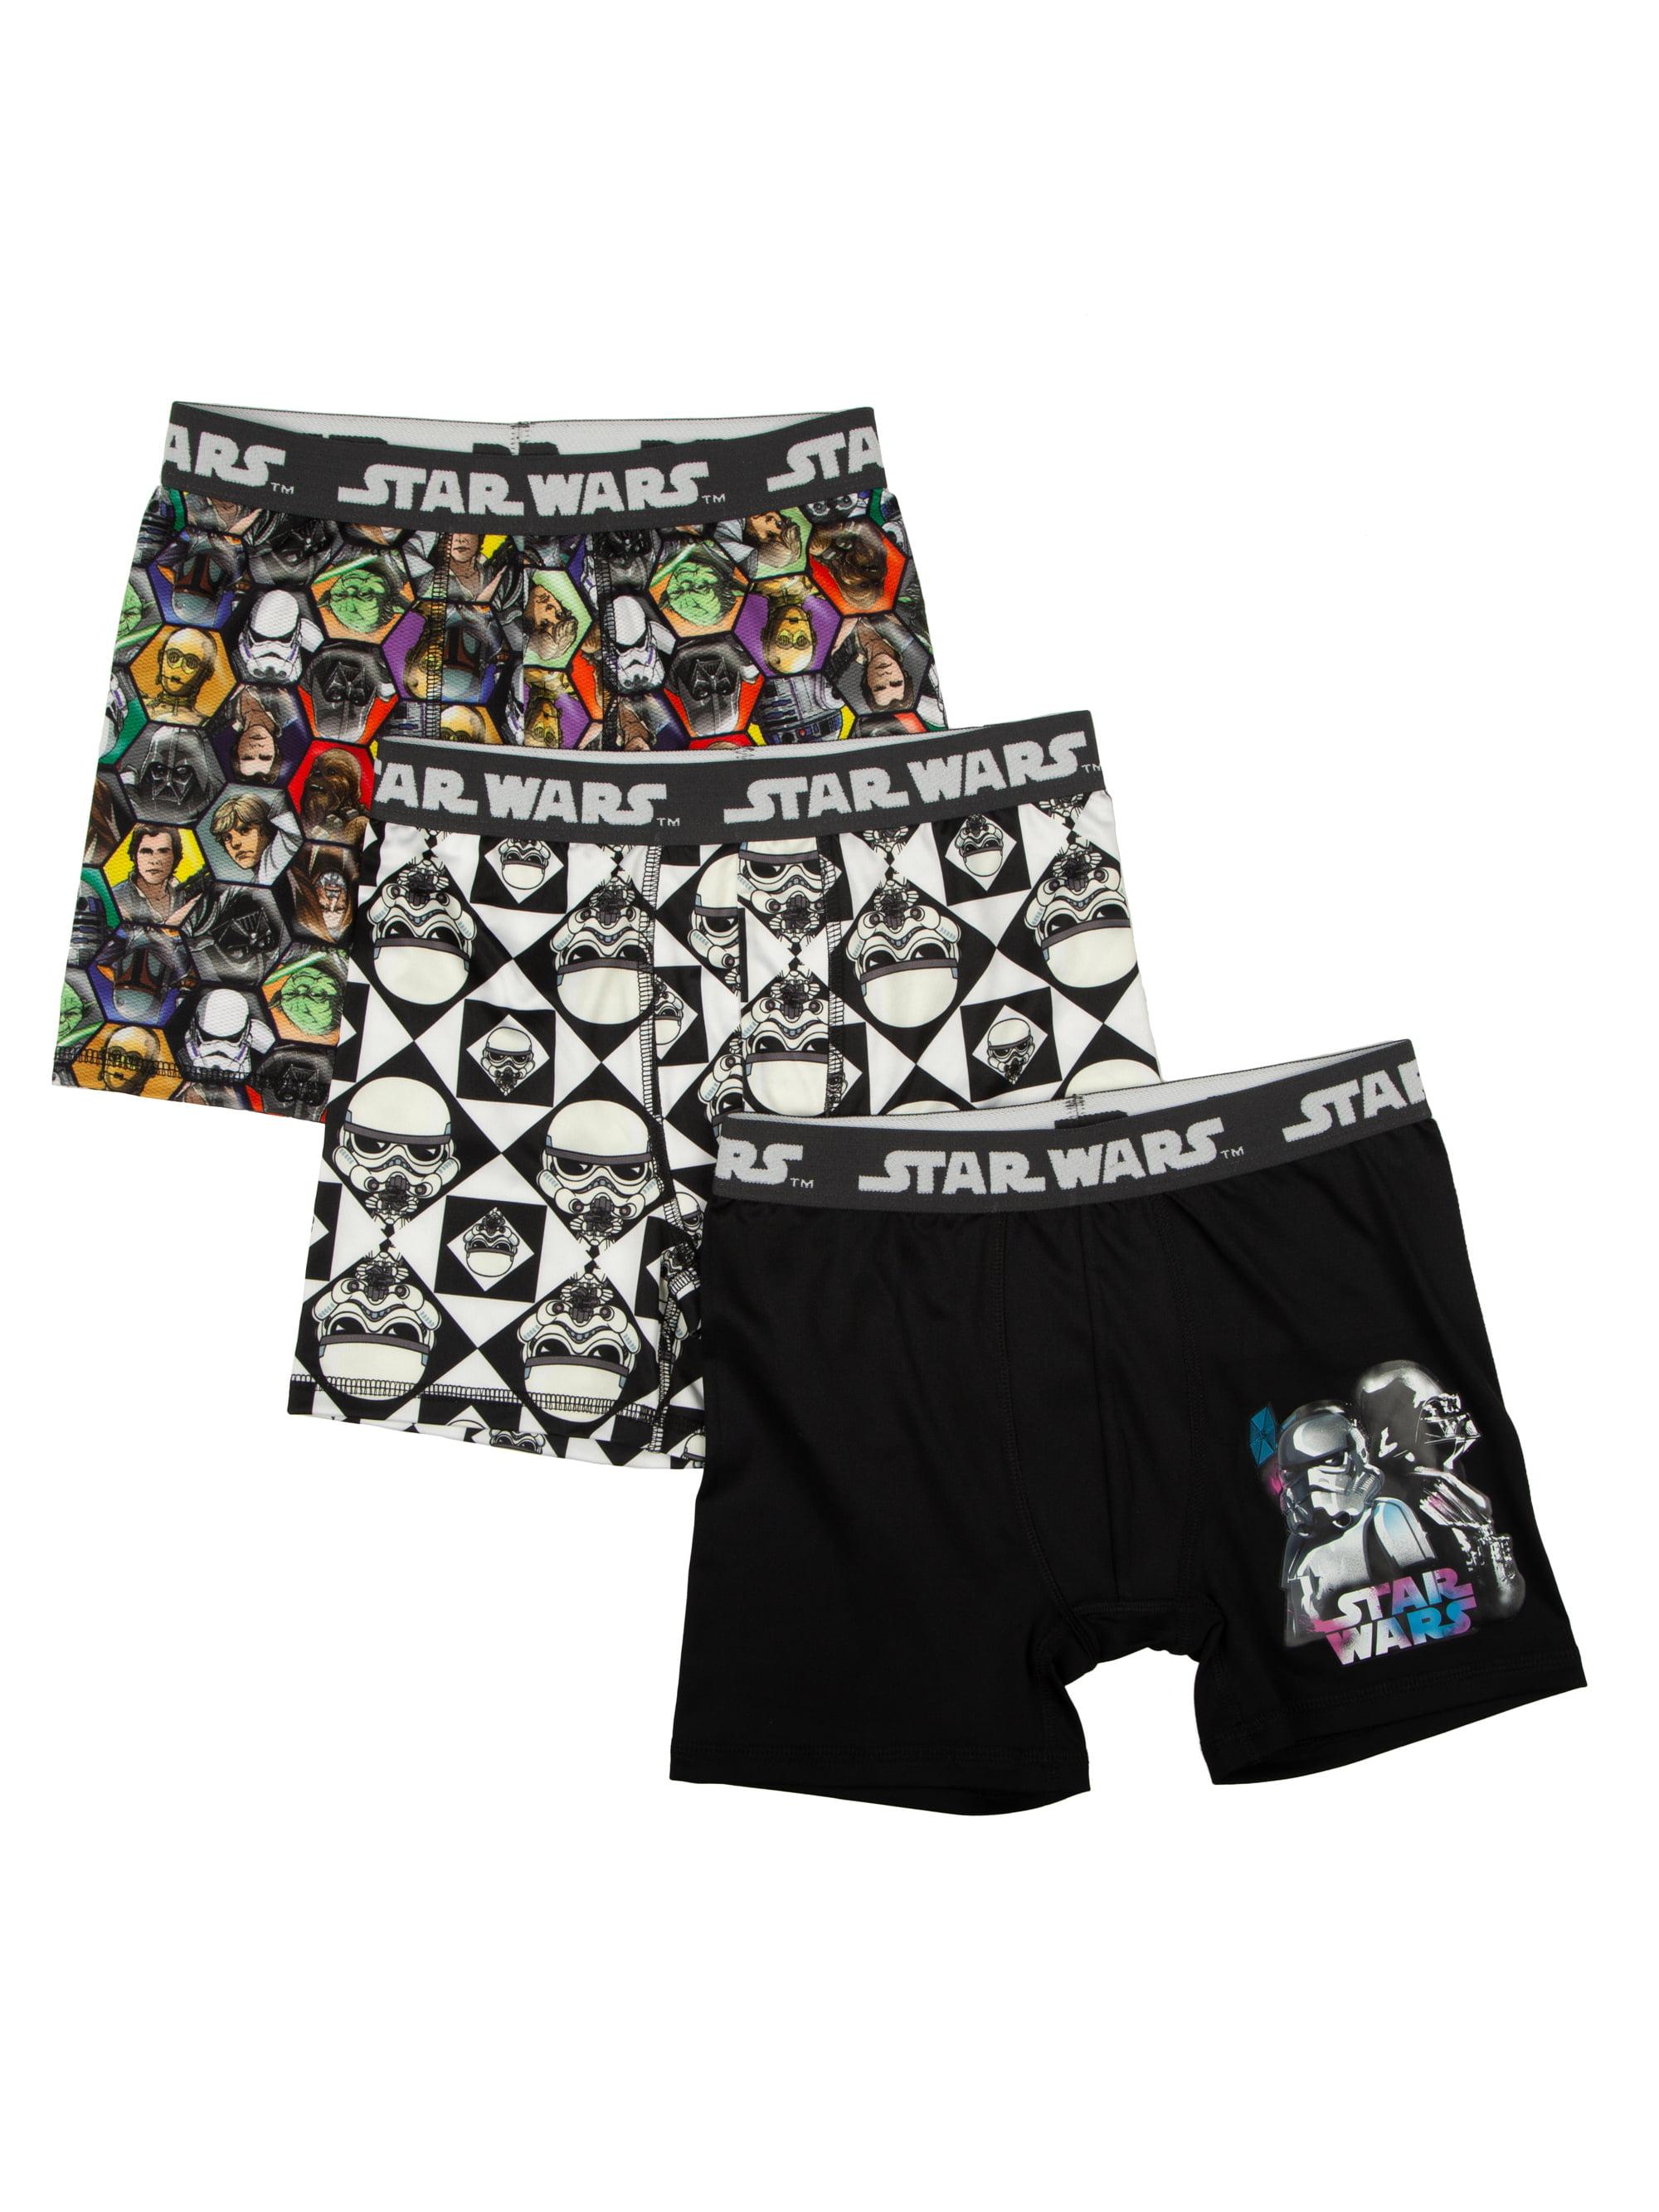 Star Wars Poly Boxer Briefs, 3 Pack (Big Boys & Little Boys)